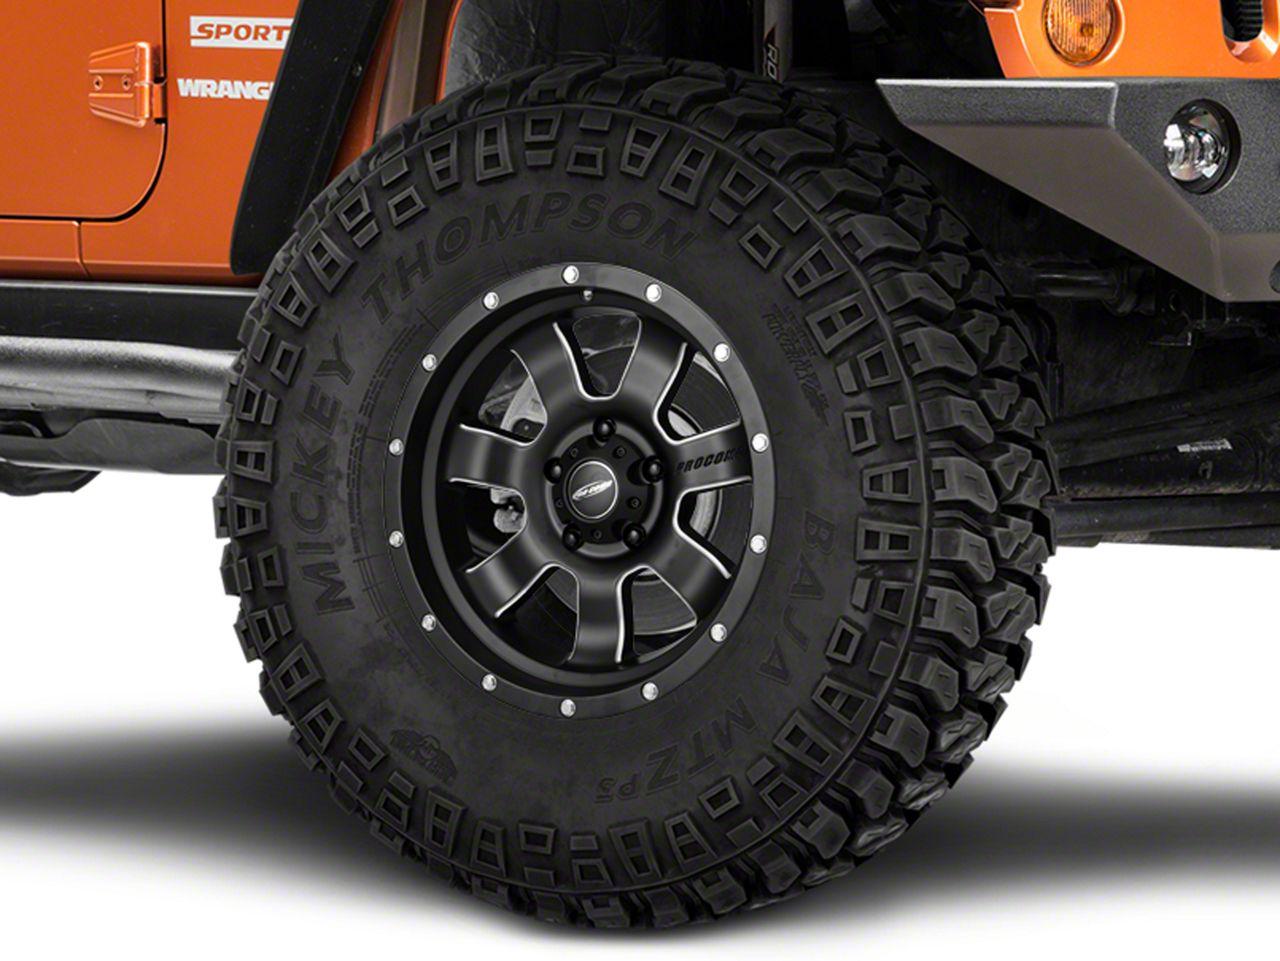 Pro Comp Alloy Series 39 Inertia Satin Black Milled Wheel - 17x9 (07-18 Jeep Wrangler JK; 2018 Jeep Wrangler JL)